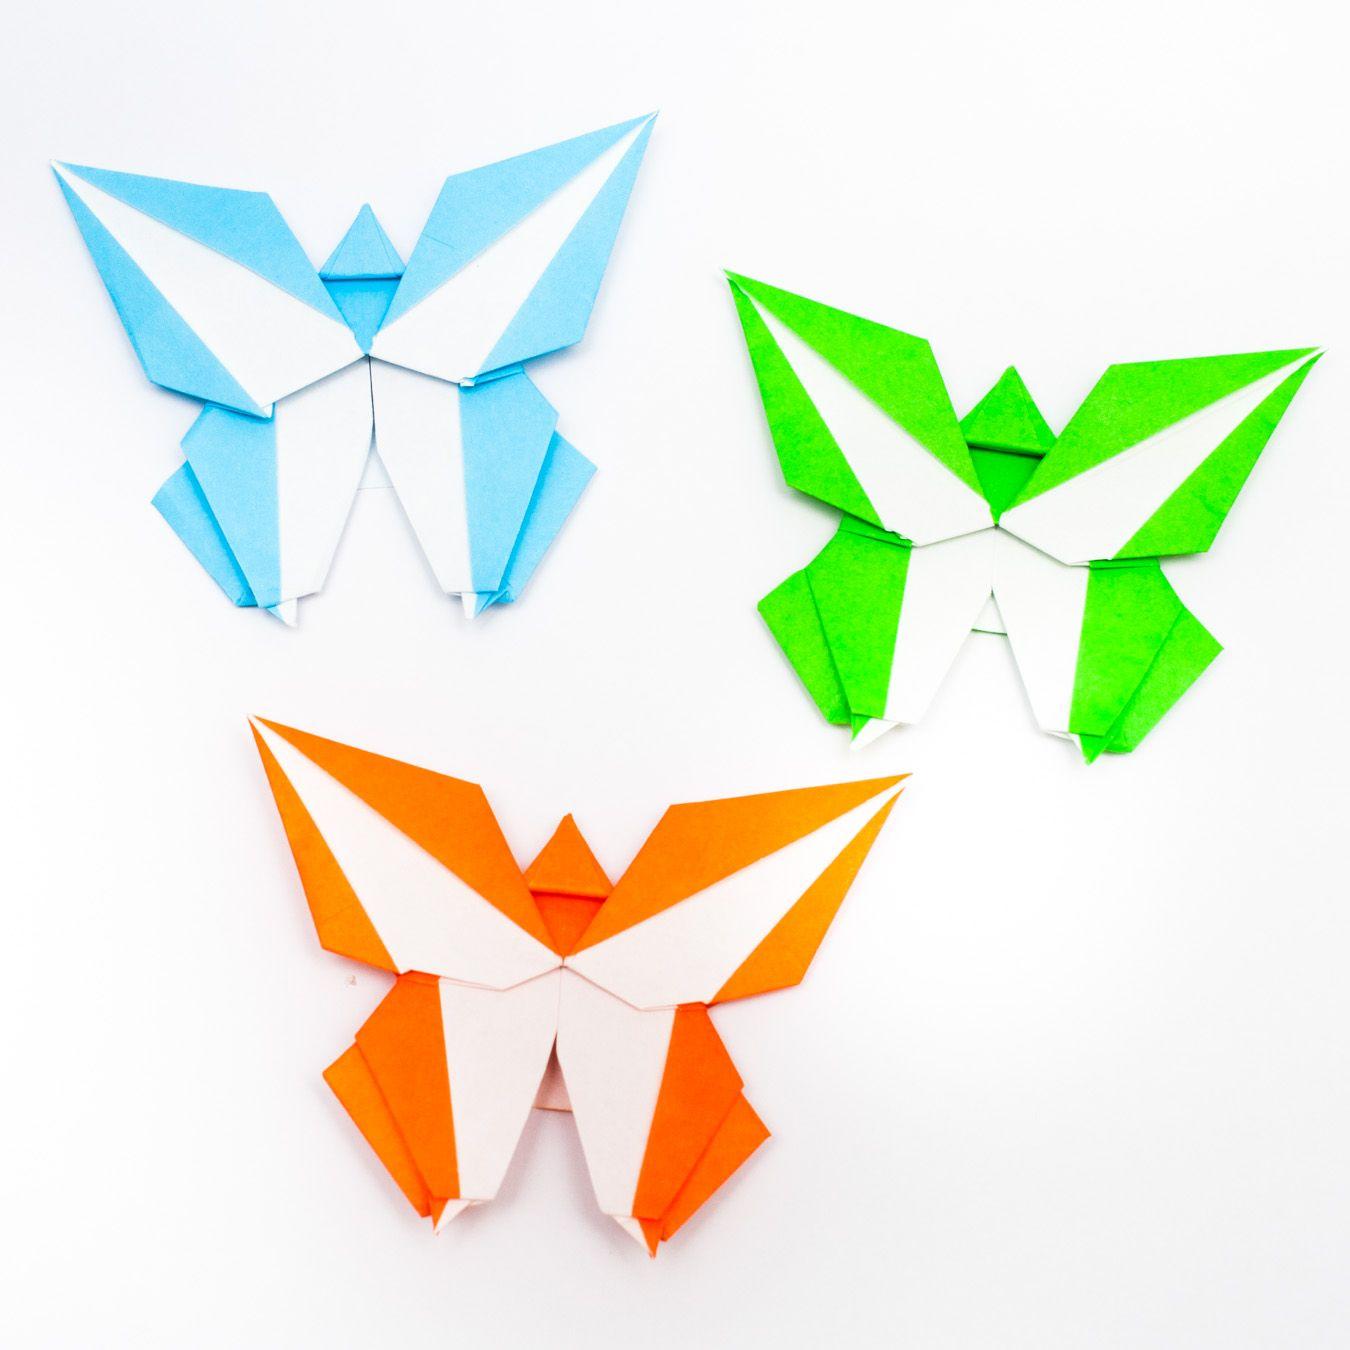 Origami Butterfly Bookmark - วิธีพับกระดาษเป็นที่คั่น ... - photo#35